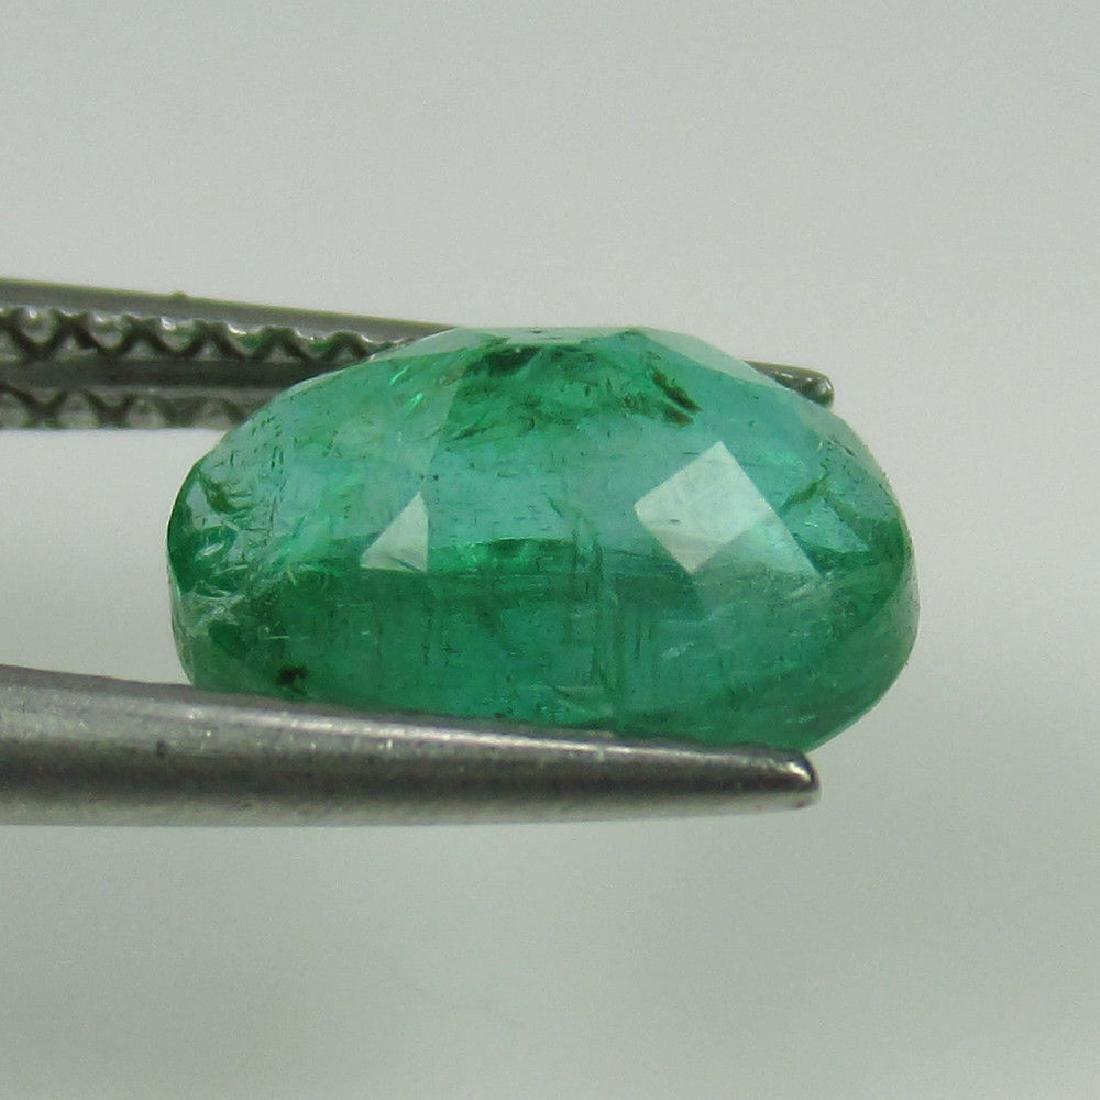 1.79 Ct Genuine Zambian Emerald Nice Oval Cut - 3